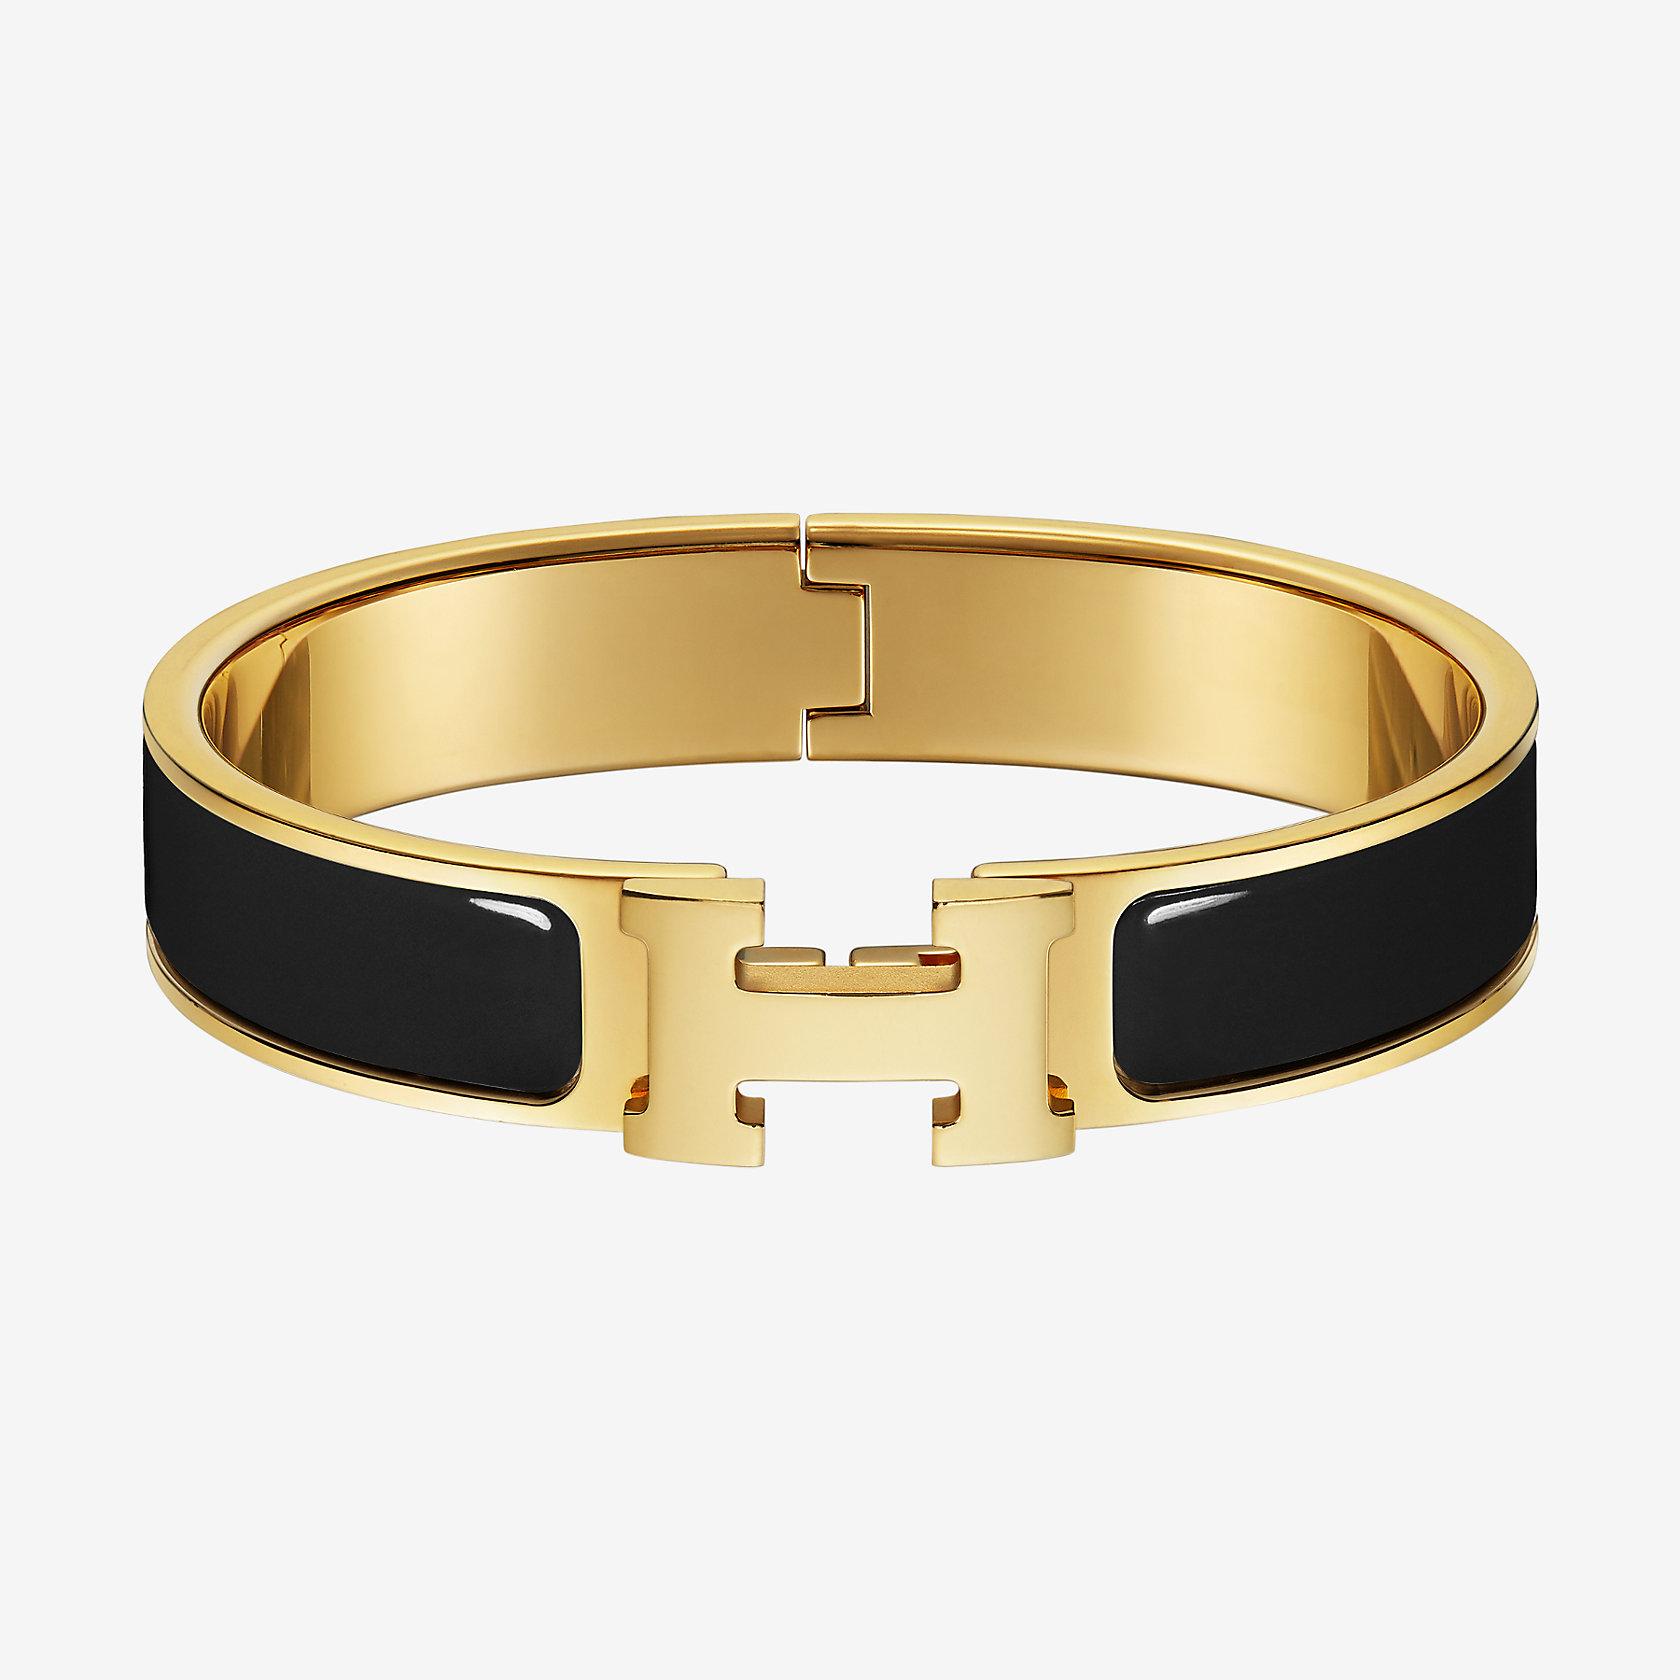 prix bracelet hermes femme